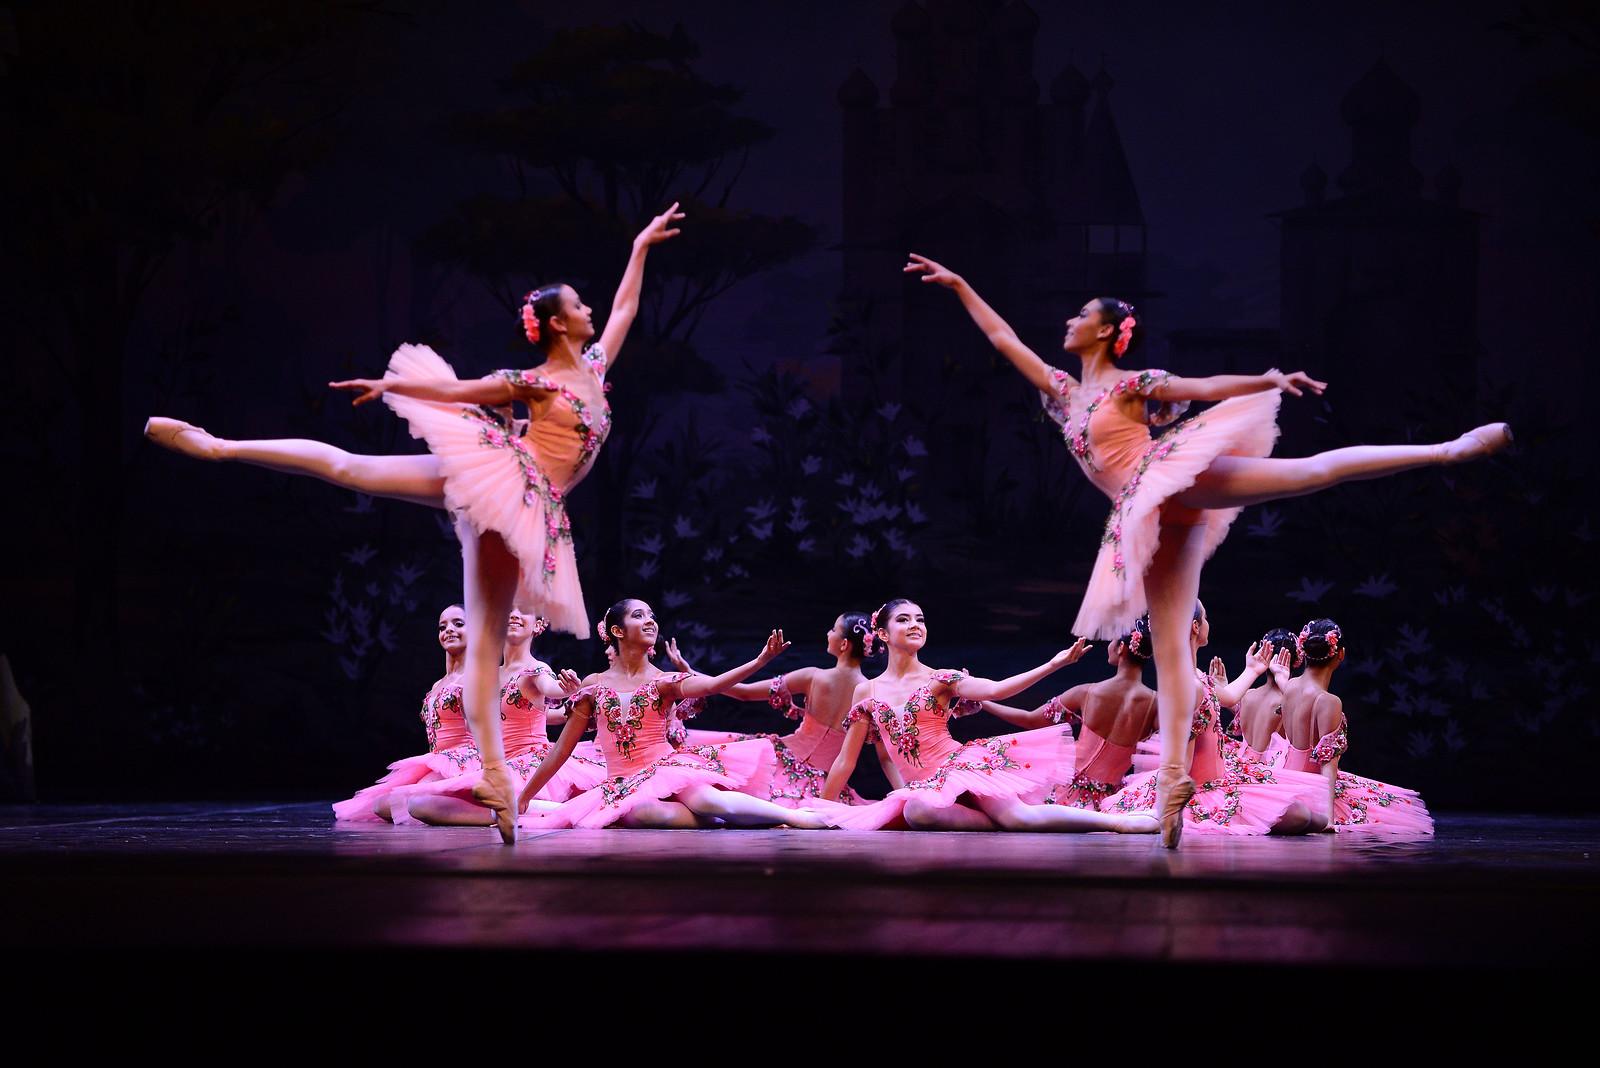 Mostra Competitiva 28.07.2017 - 35º Festival de Dança de Joinville